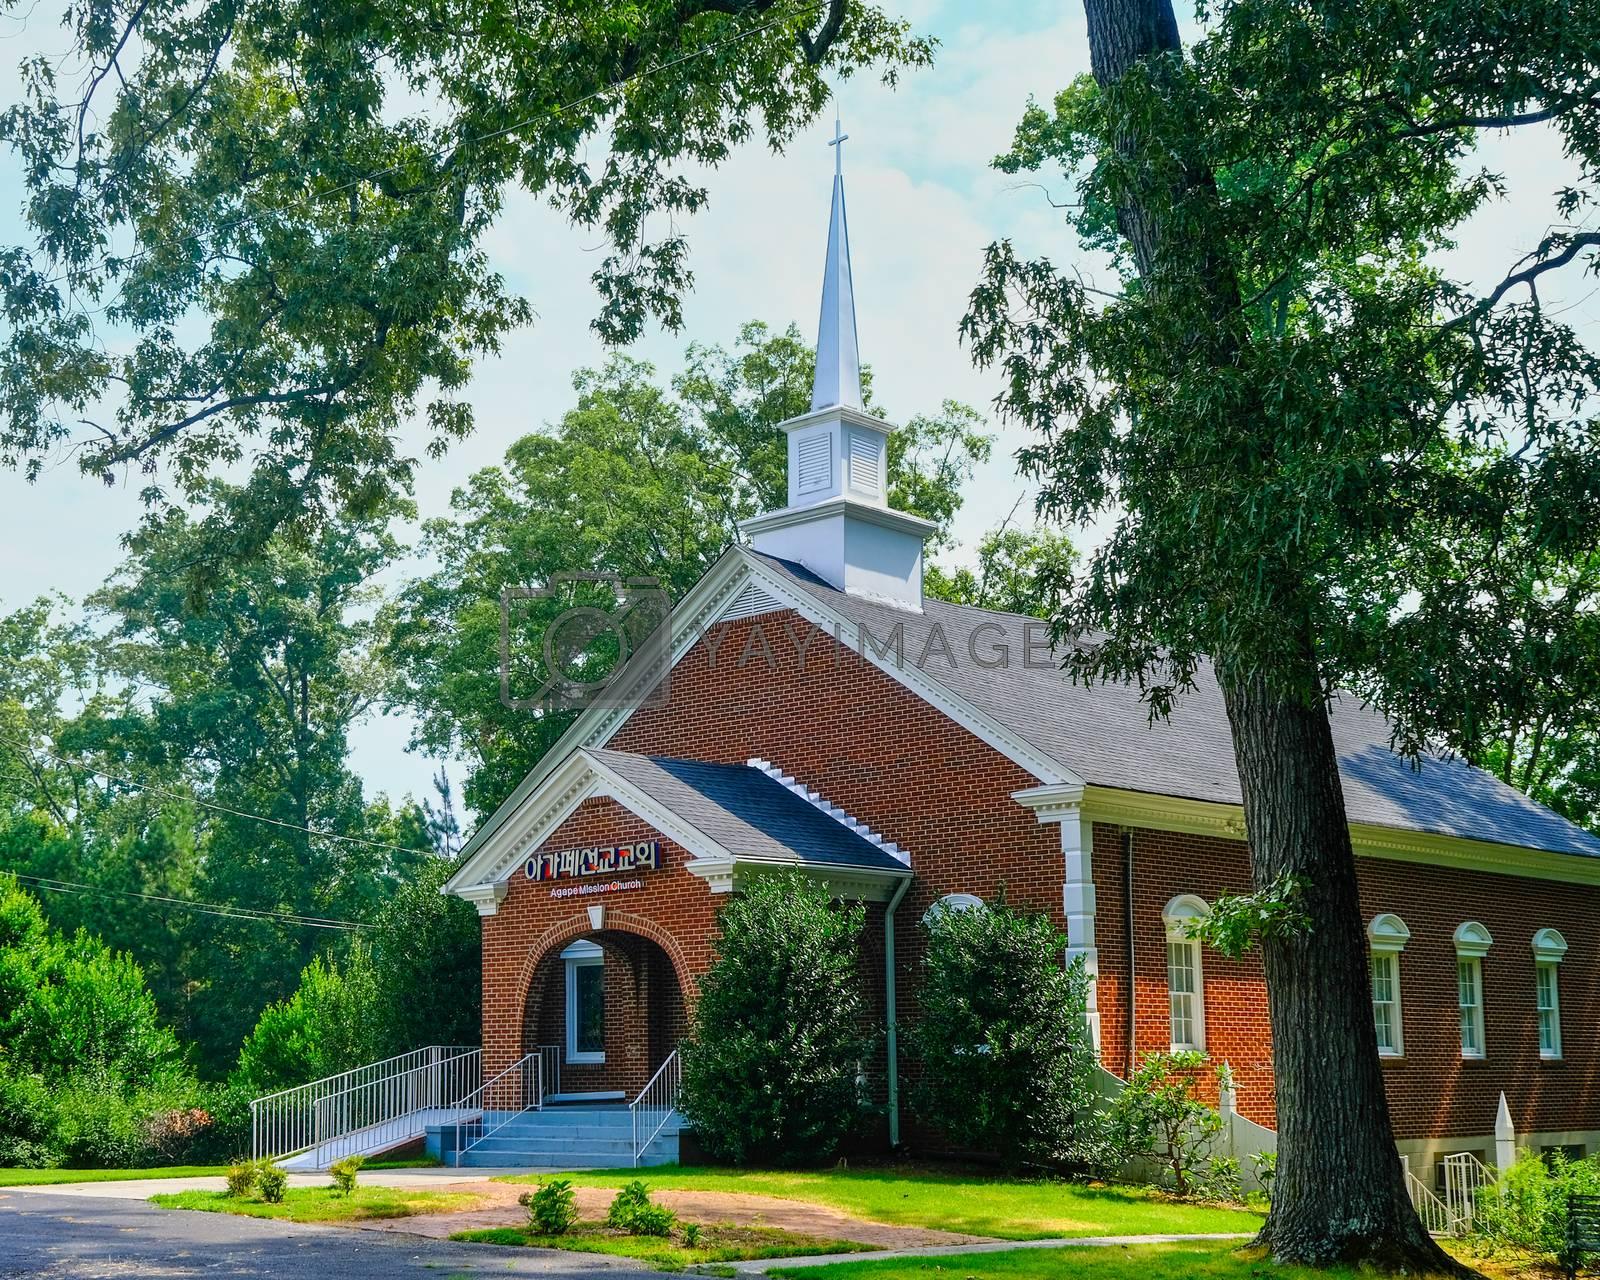 CUMMING, GEORGIA - July 21, 2020: The Agape Mission Church is an evangelical church that serves the Korean community